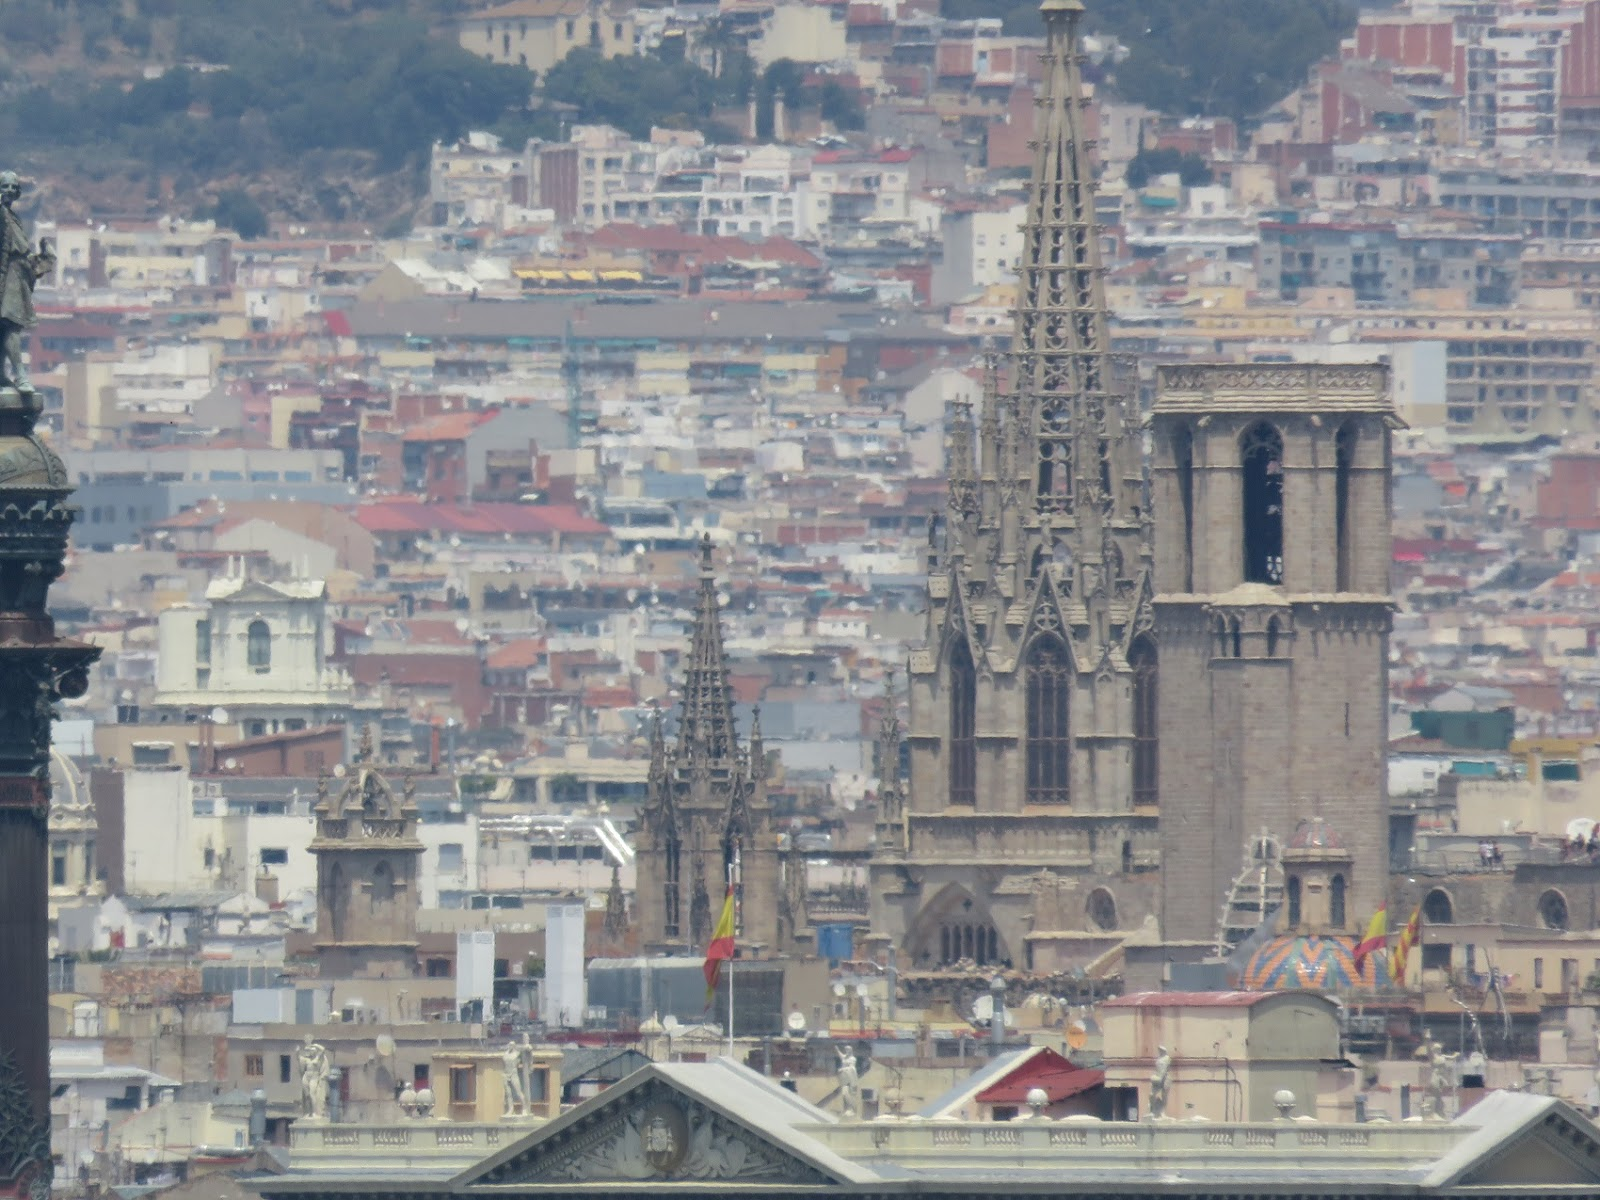 Susanna's TravelsLively Susanna's TravelsLively Matkavinkit Barcelonaan Barcelona Barcelona Barcelonaan Matkavinkit Susanna's Igb7mvf6yY